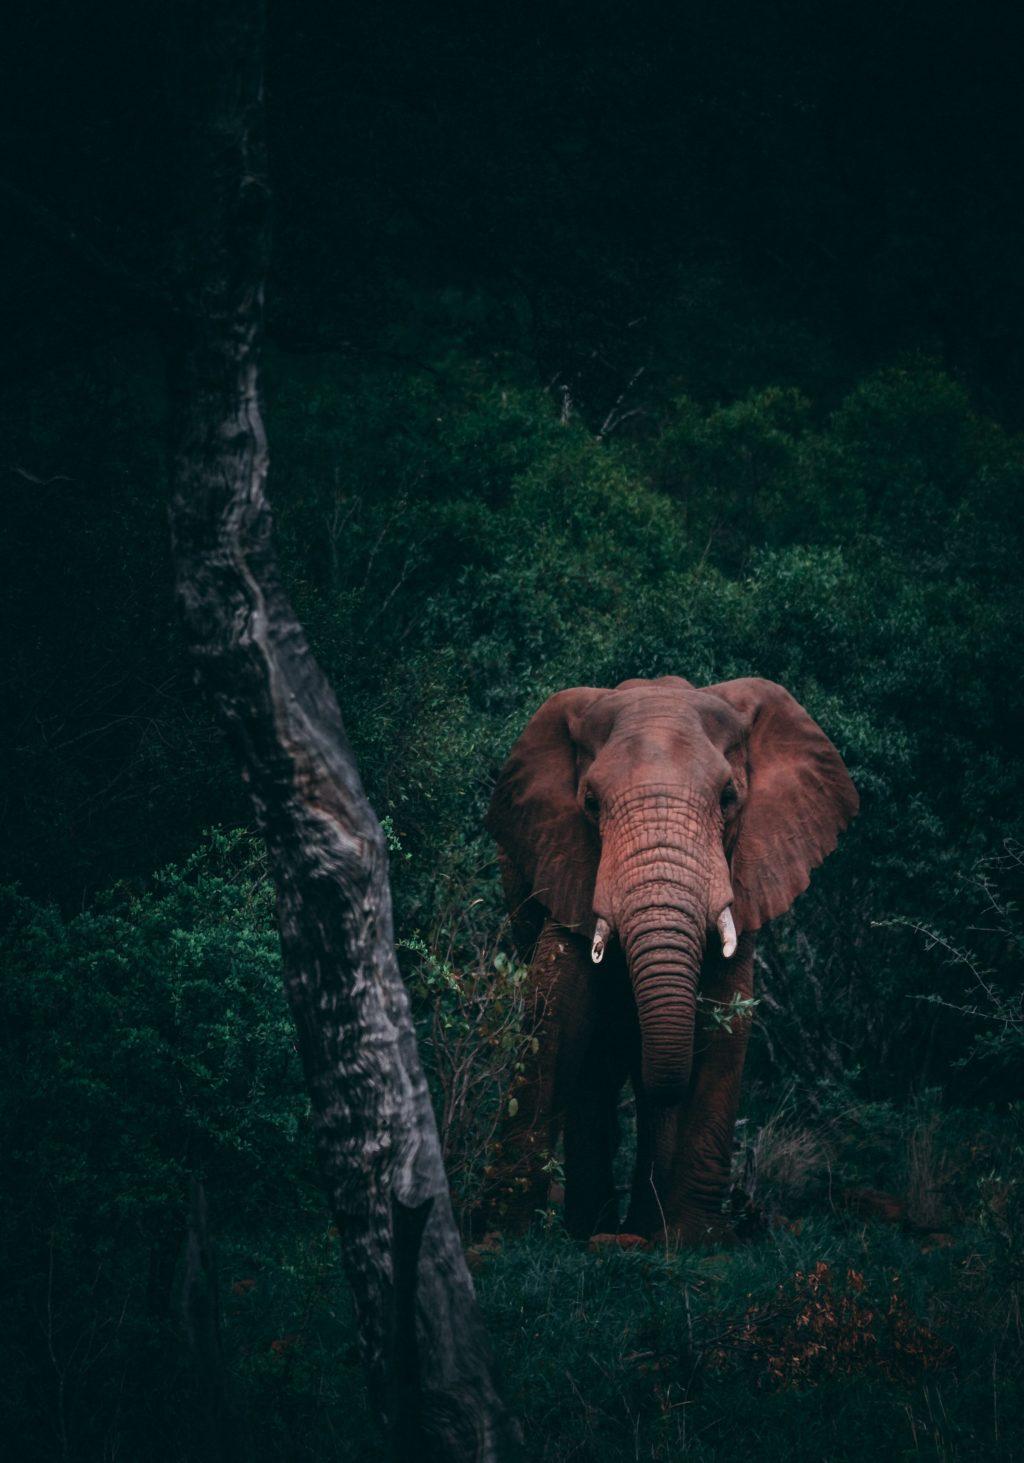 Mozambican Safari Camp - Milibangalala, Maputo Elephant Reserve